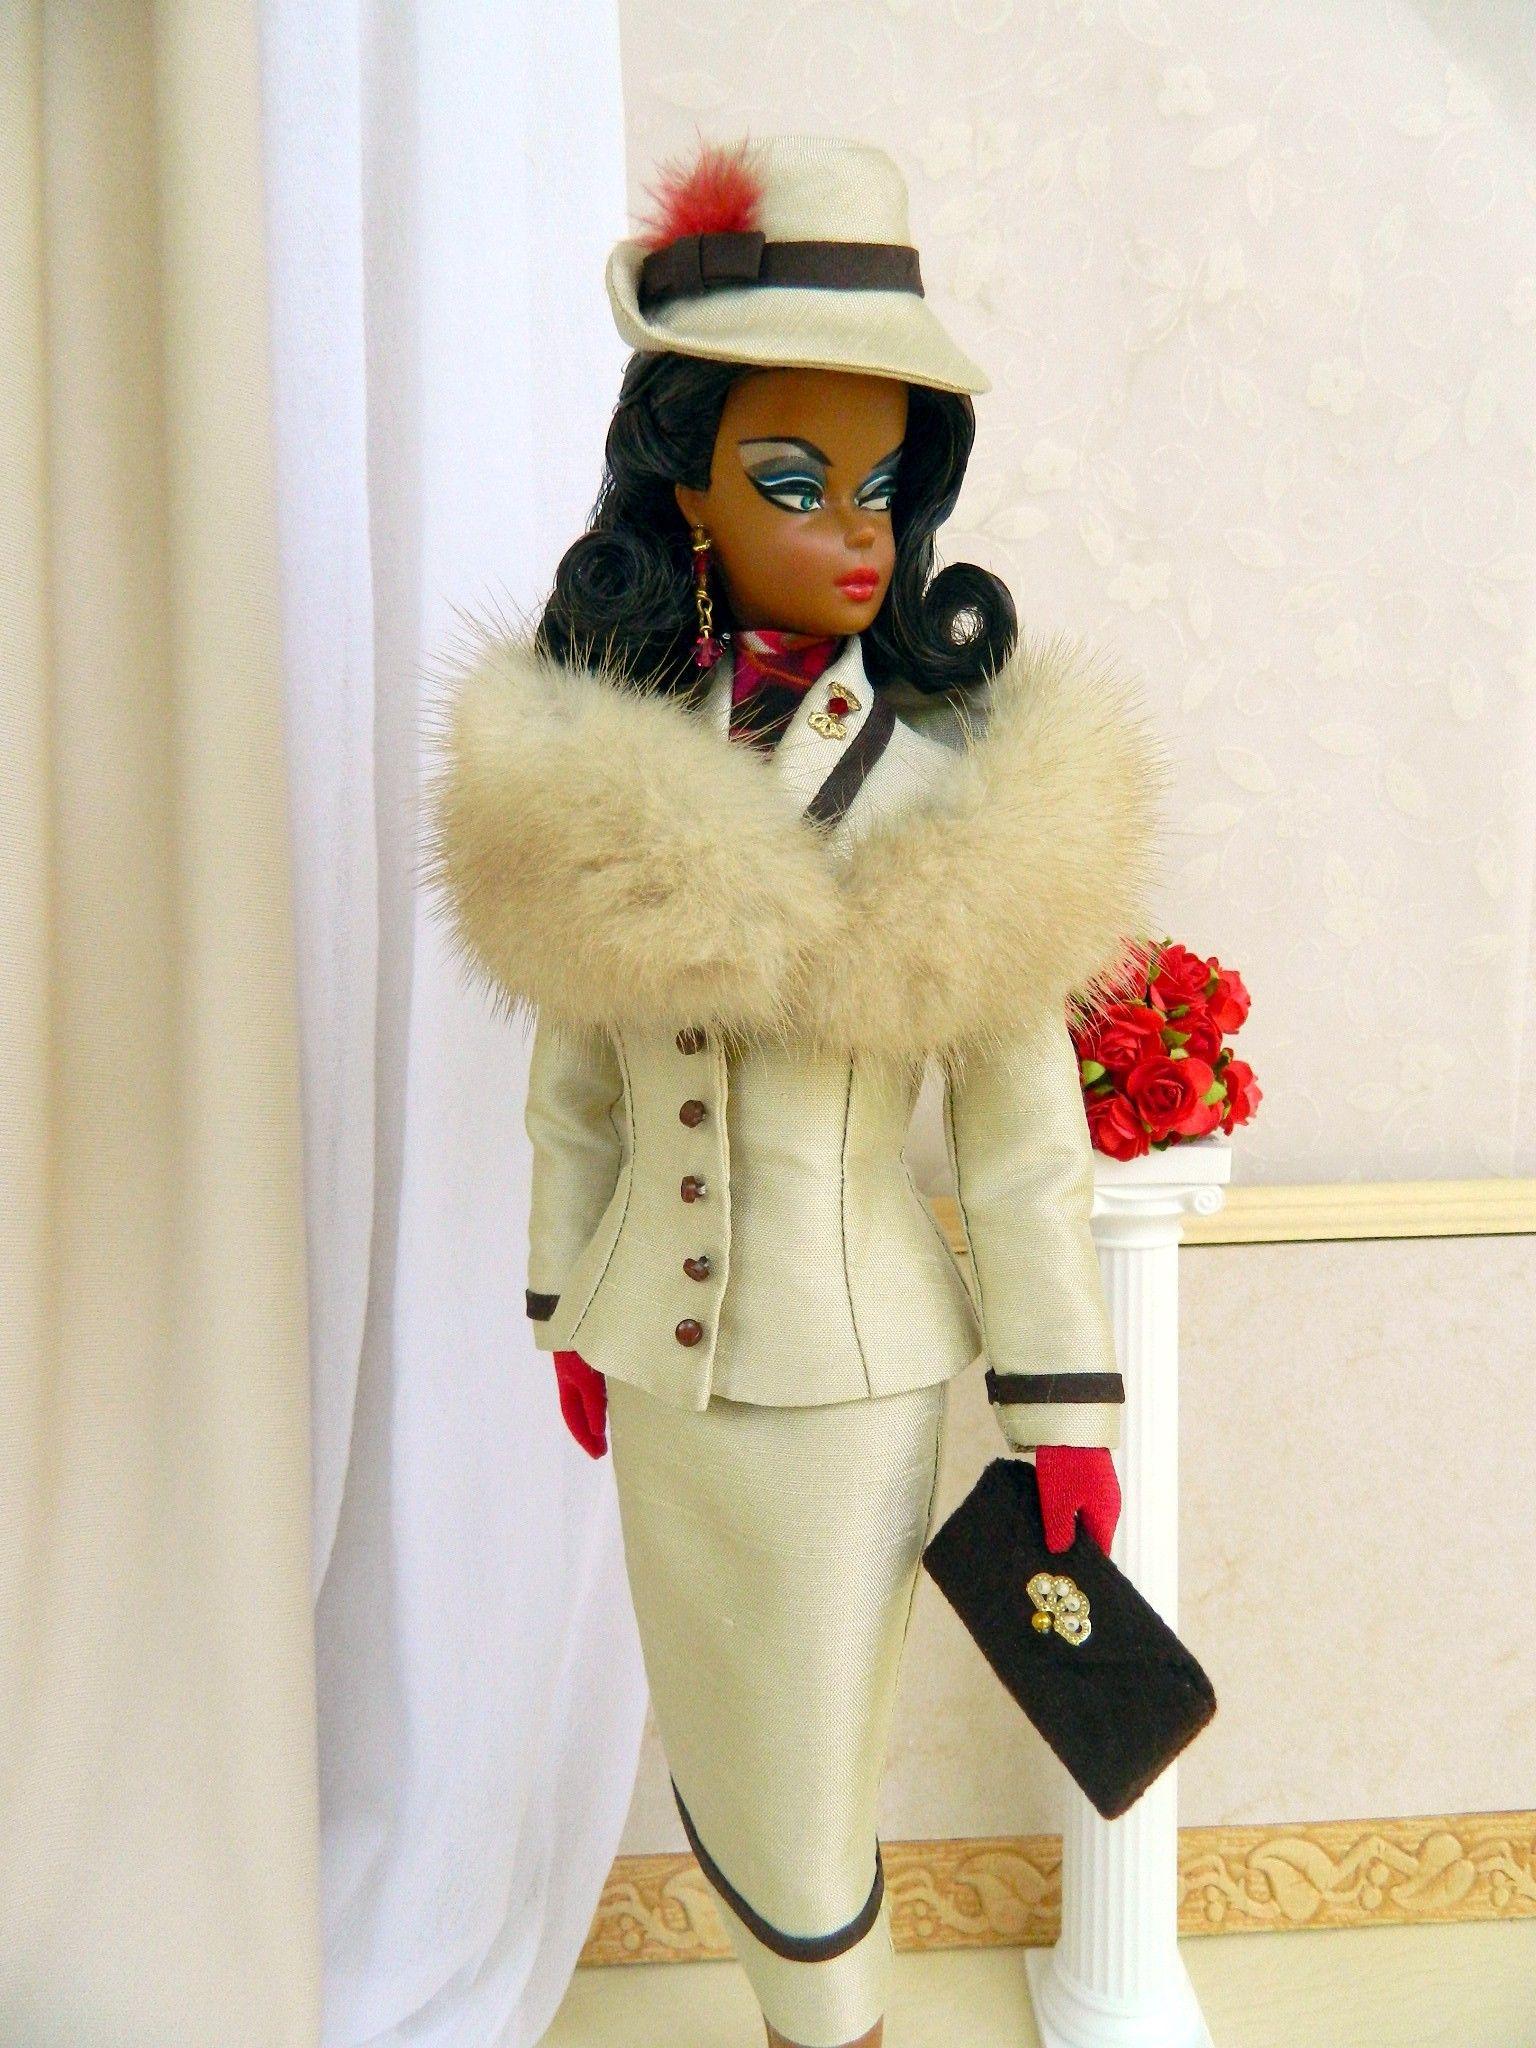 OOAK fashion for Silkstone/Vintage Barbie & Fashion Royalty Dolls by Joby Originals.